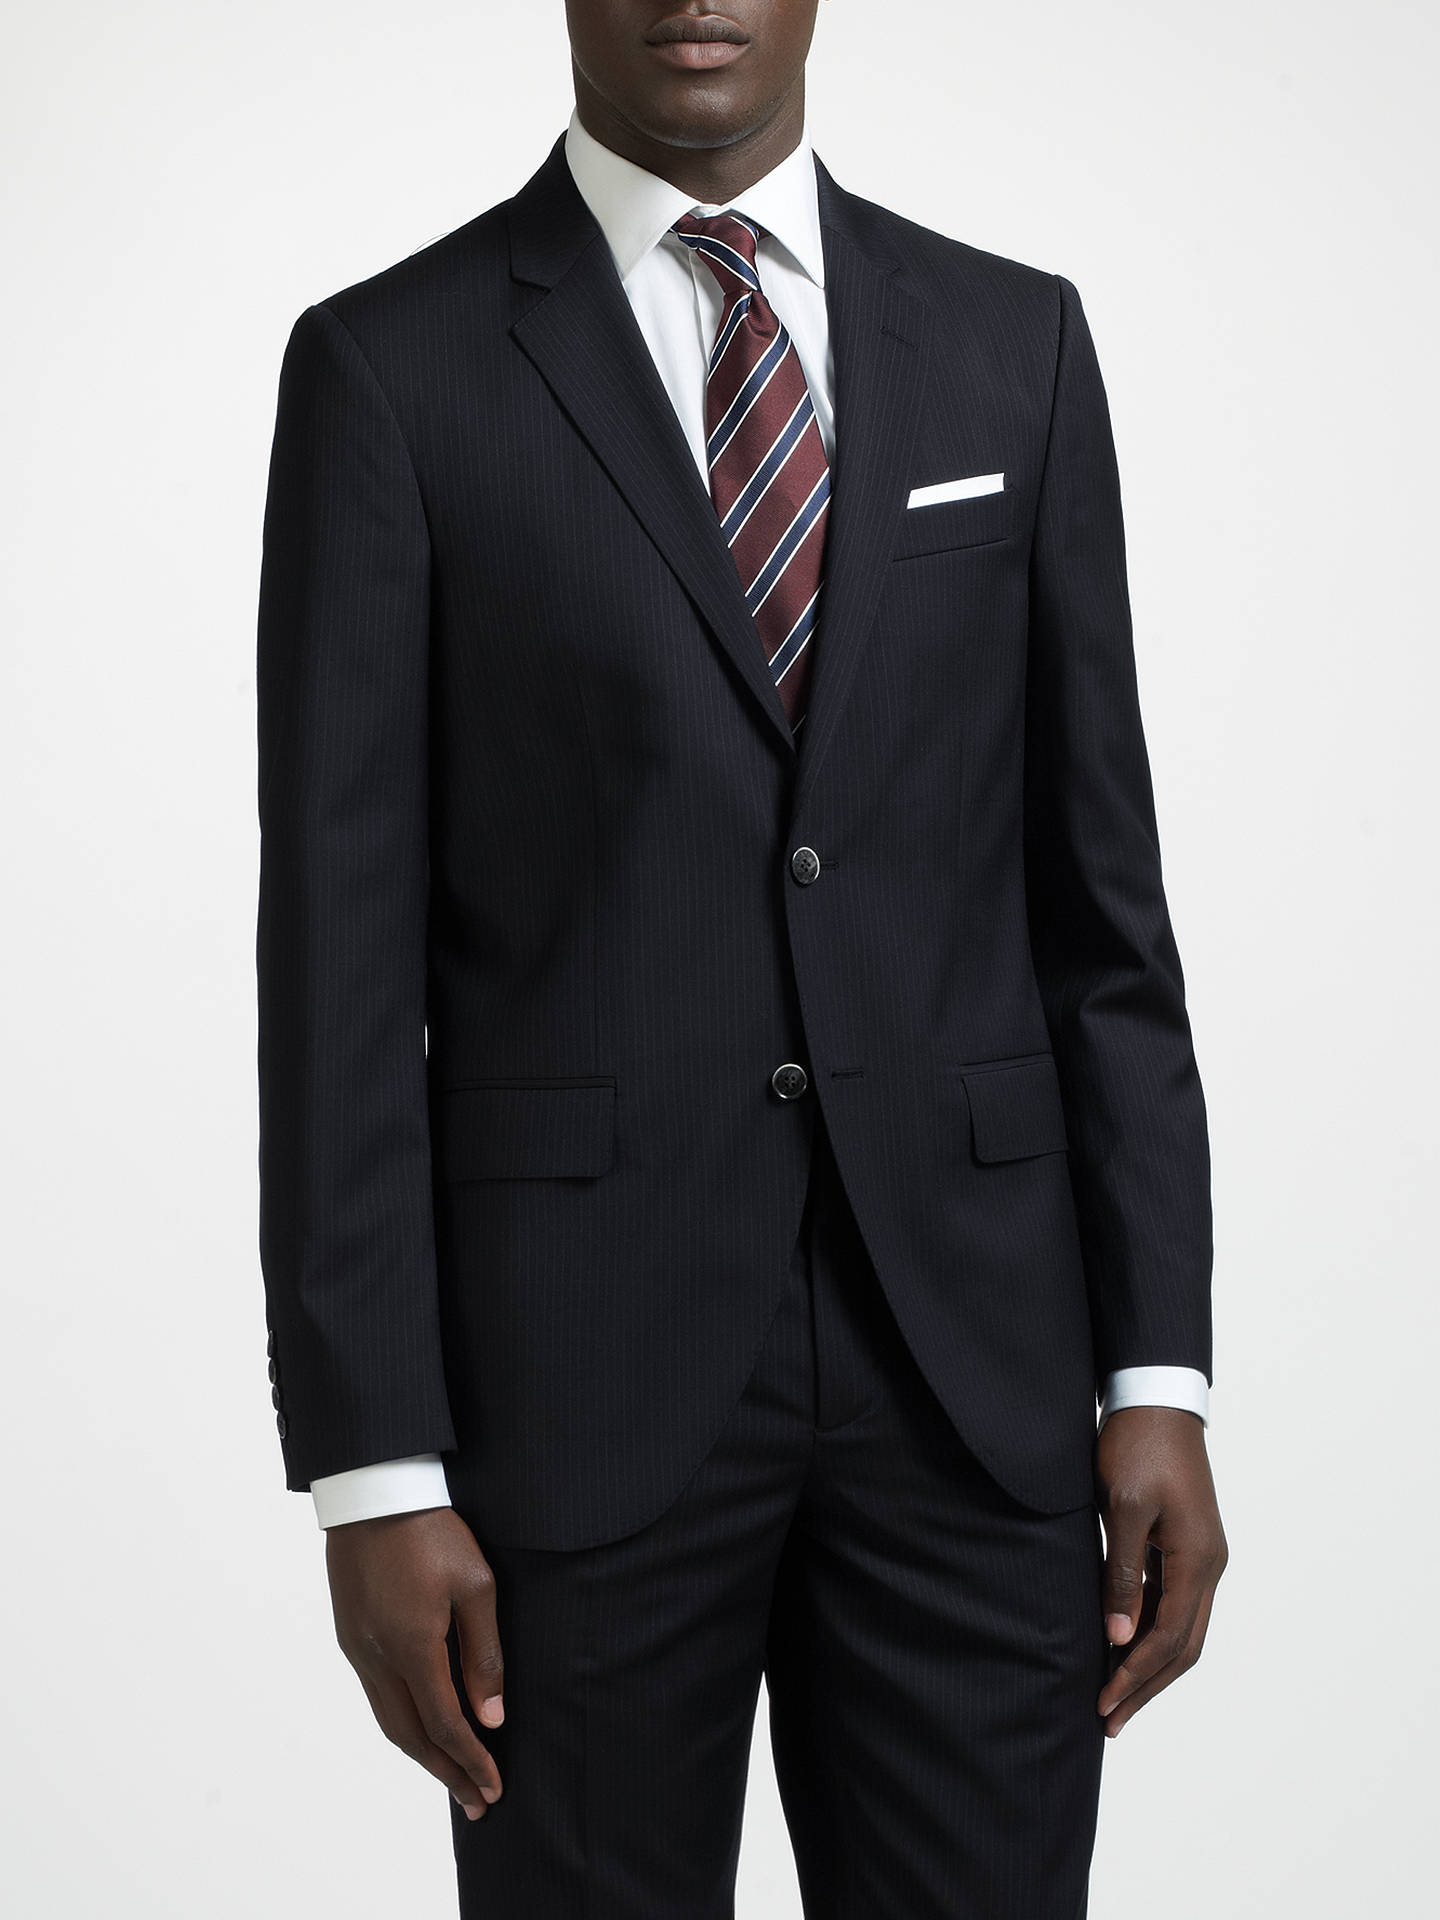 Hackett london super 120s wool pinstripe tailored suit jacket navy at john lewis partners - Hackett london head office ...